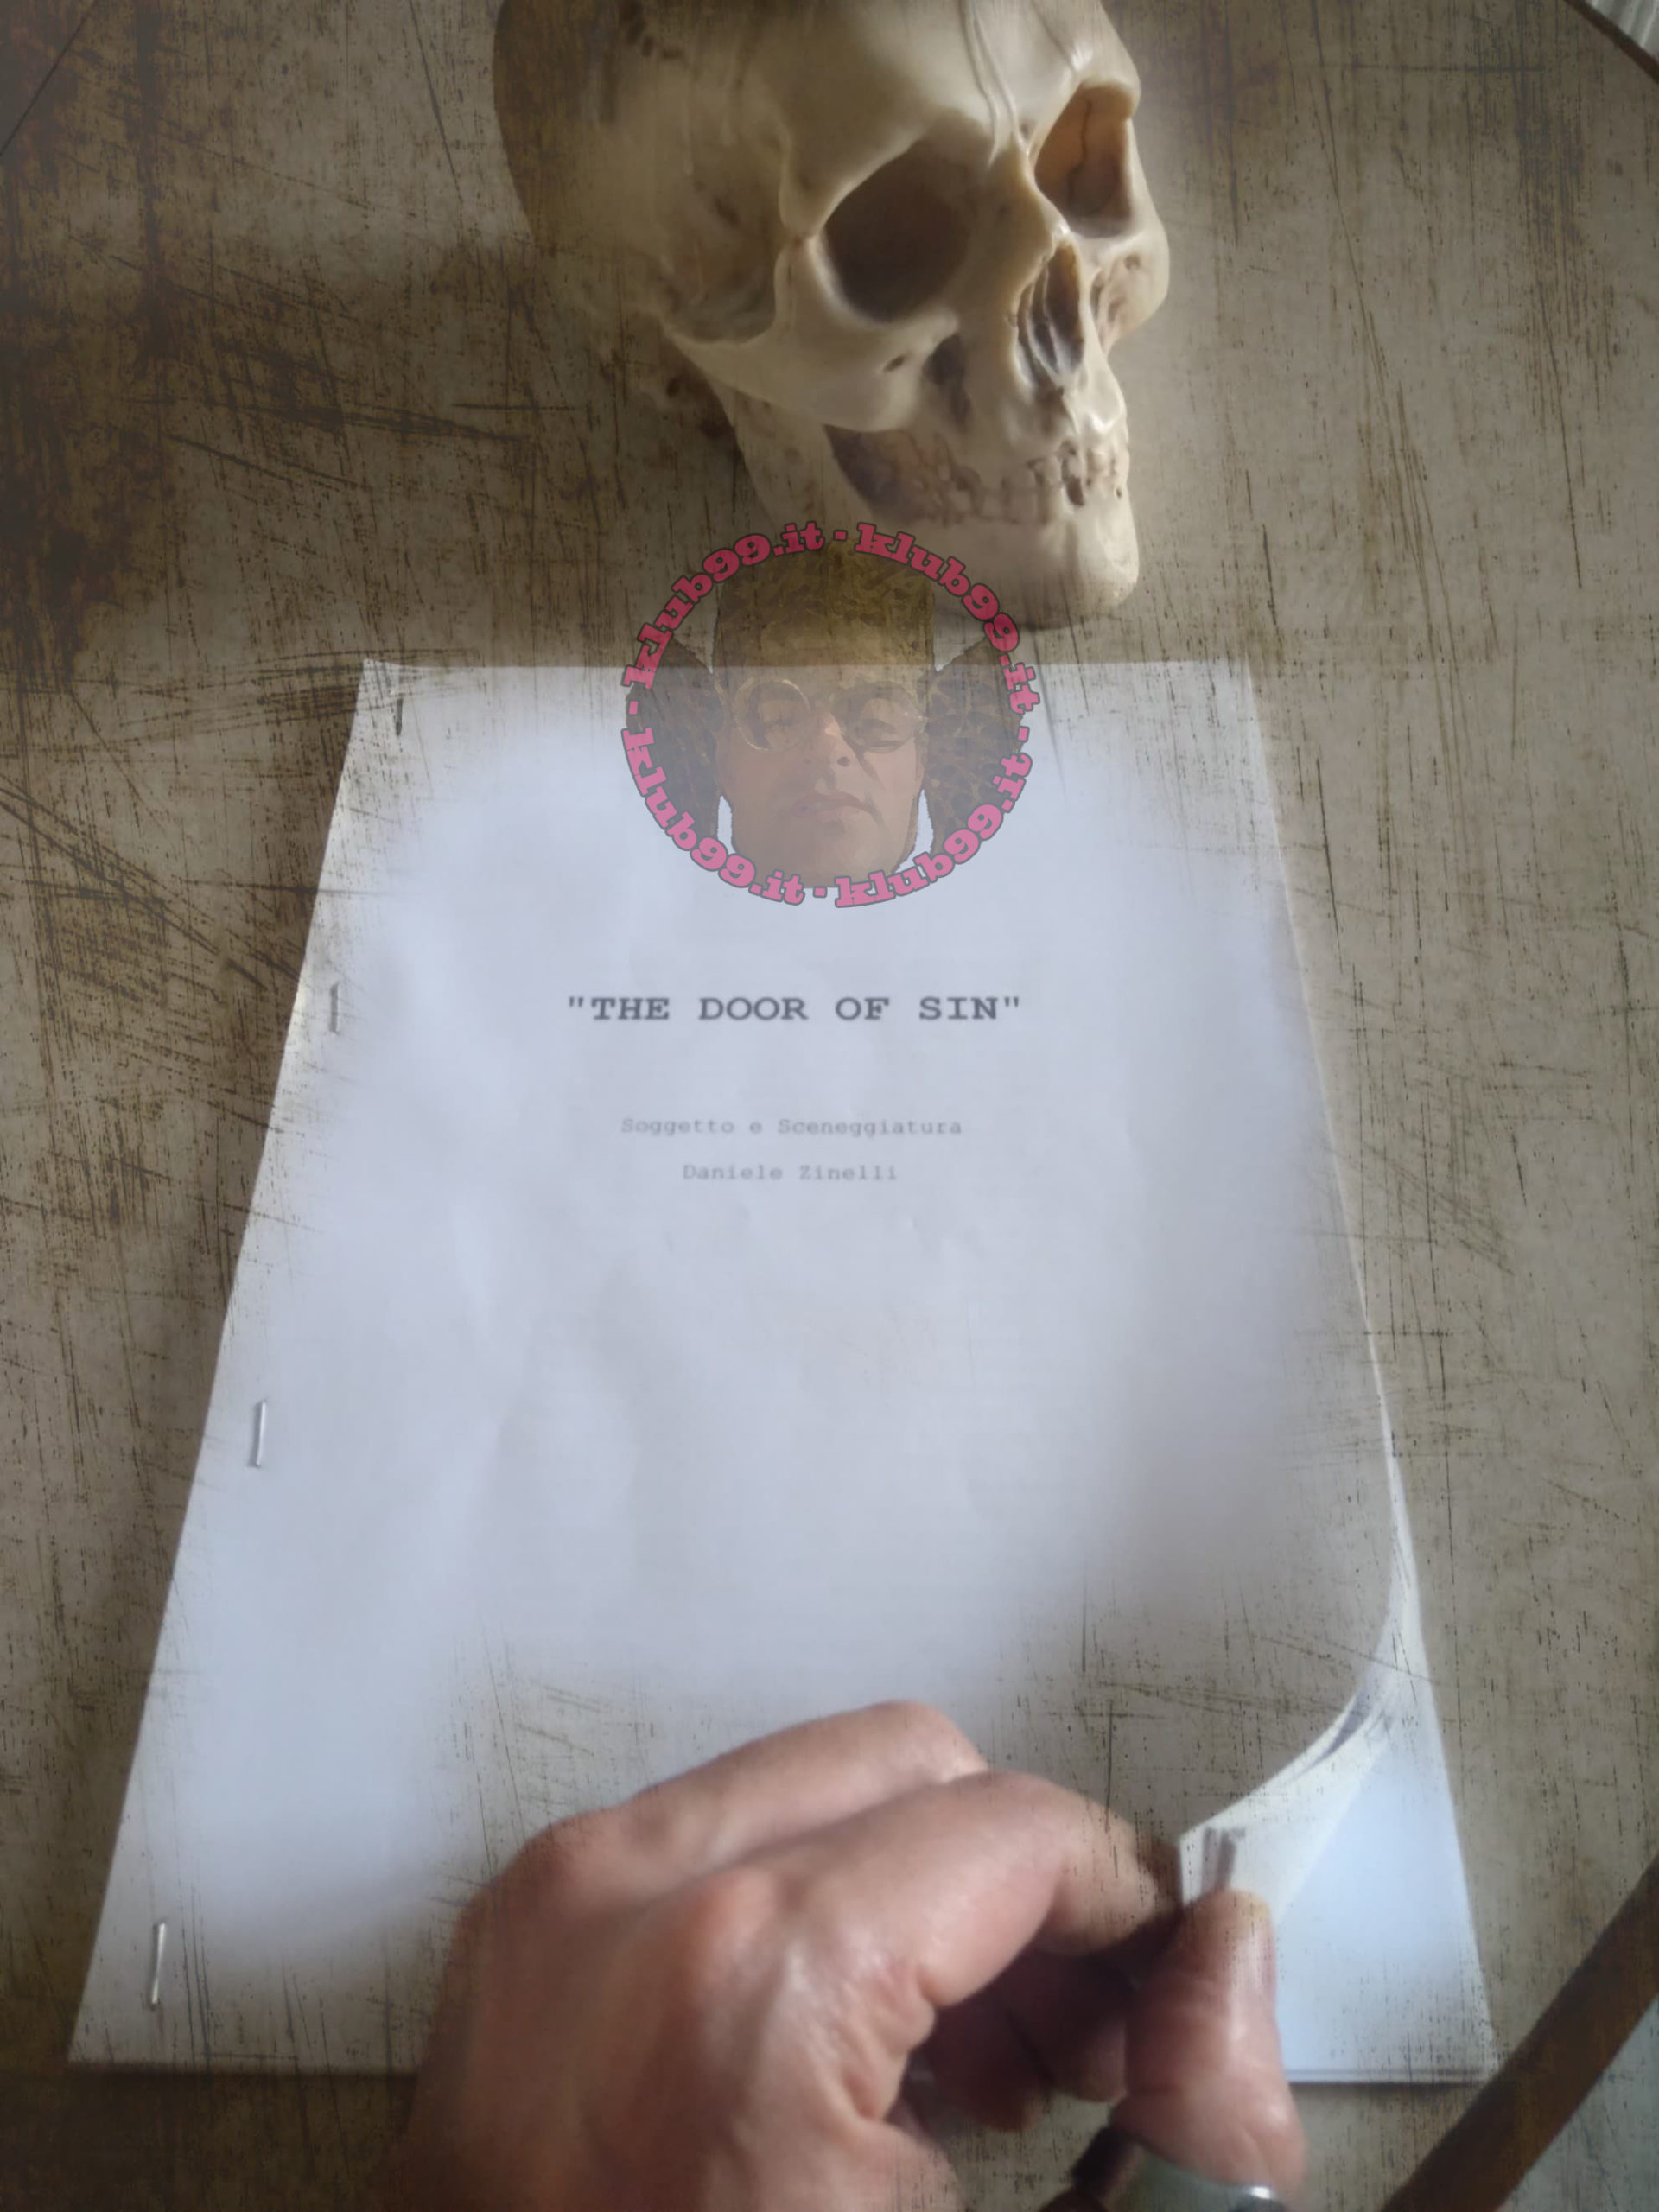 La sceneggiatura di The Door of Sin di Daniele Zinelli